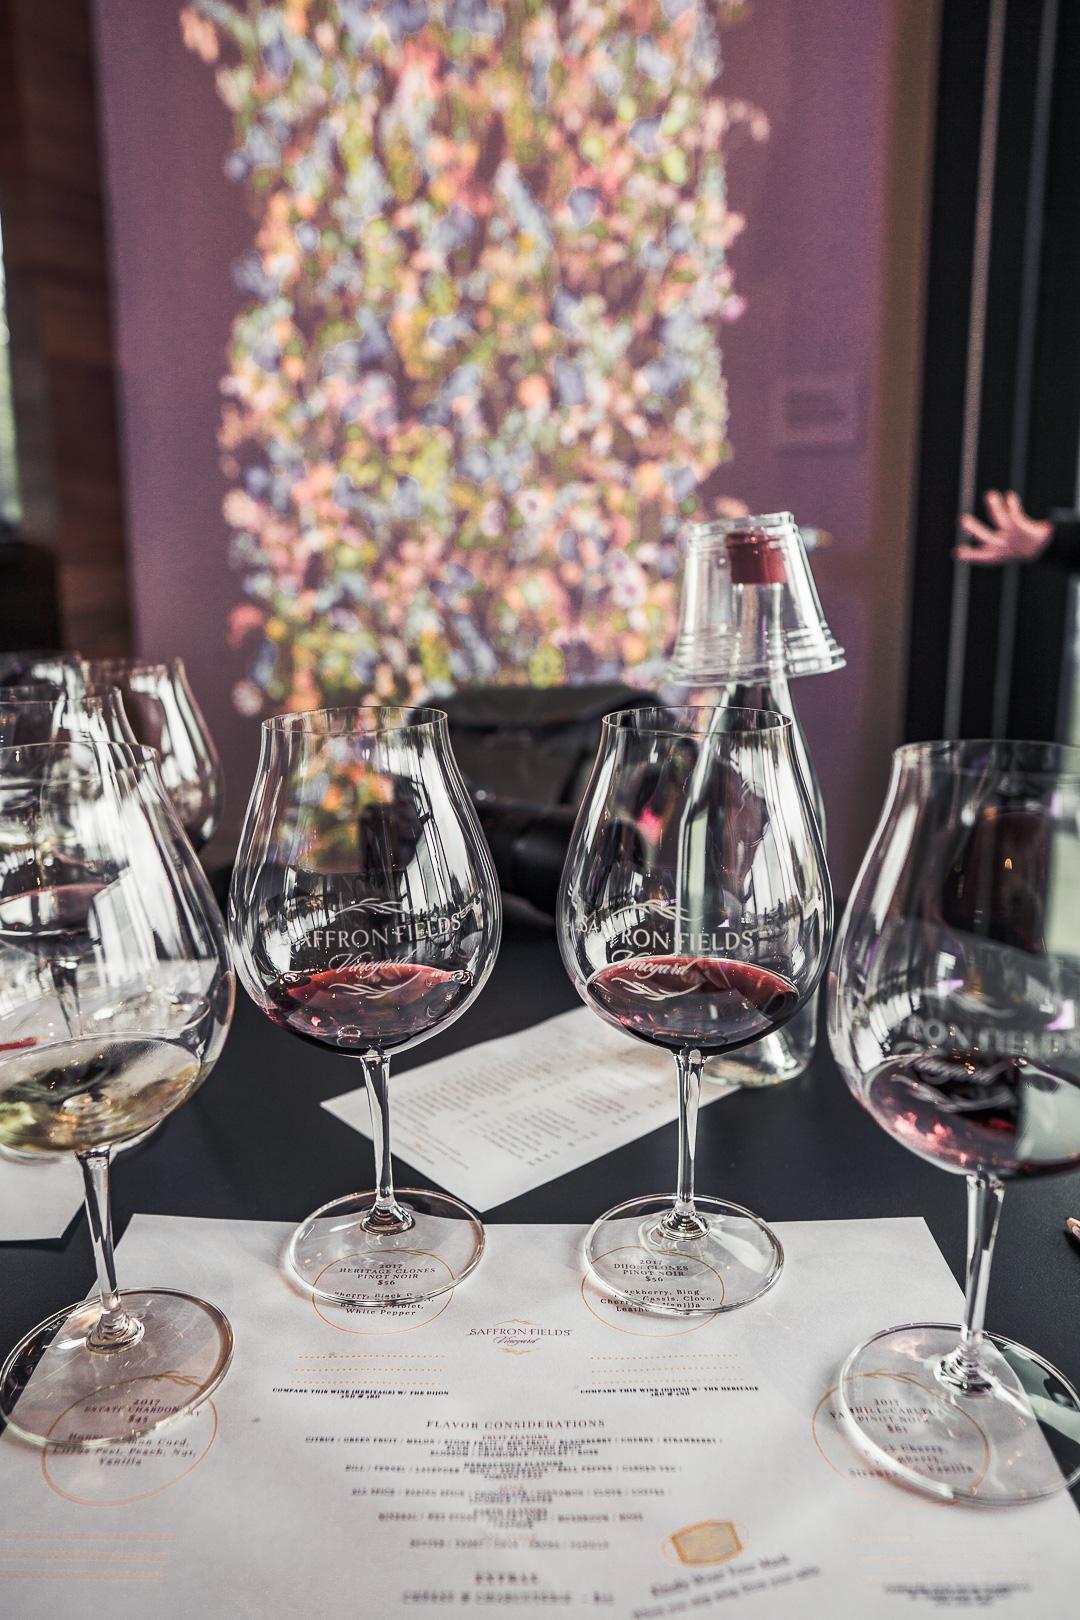 Free Wine Tasting with Alaska Airlines at Saffron Fields Vineyard